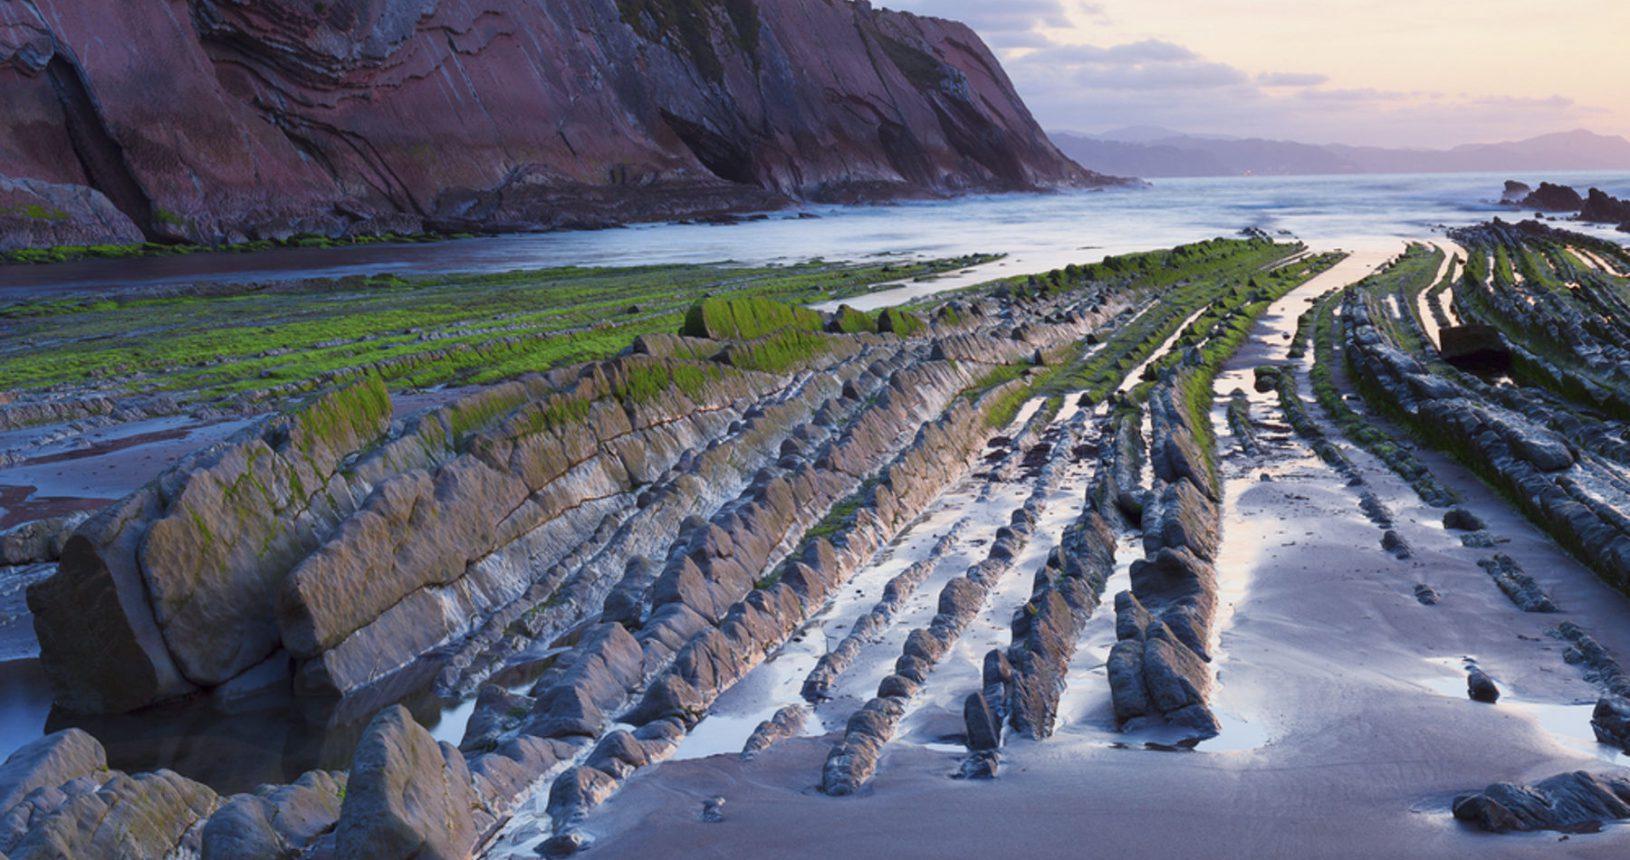 http://www.shutterstock.com/es/pic-236251198/stock-photo-itzurun-beach-flysch-of-zumaia-on-the-coast-of-gipuzkoa-spain.html?src=kZ0G6LBwtoQrRDCk_YL1dQ-1-34